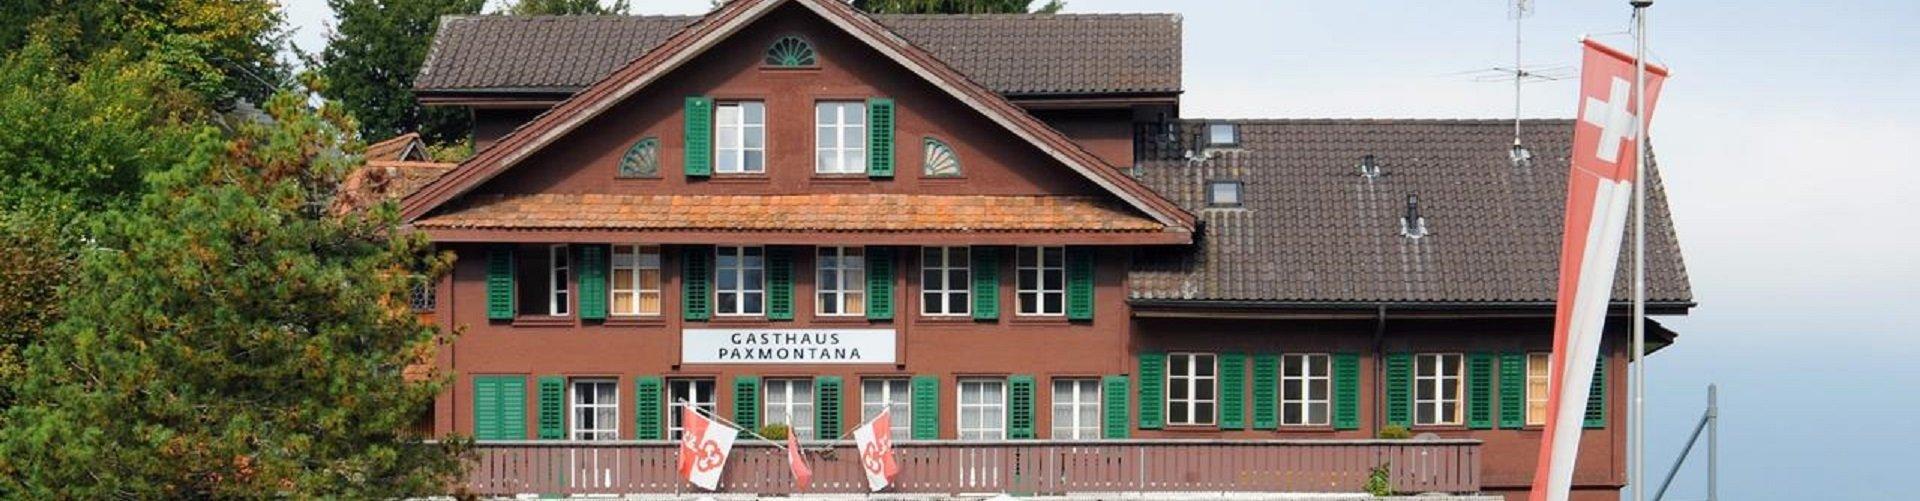 Bannerfoto Gasthaus Paxmontana